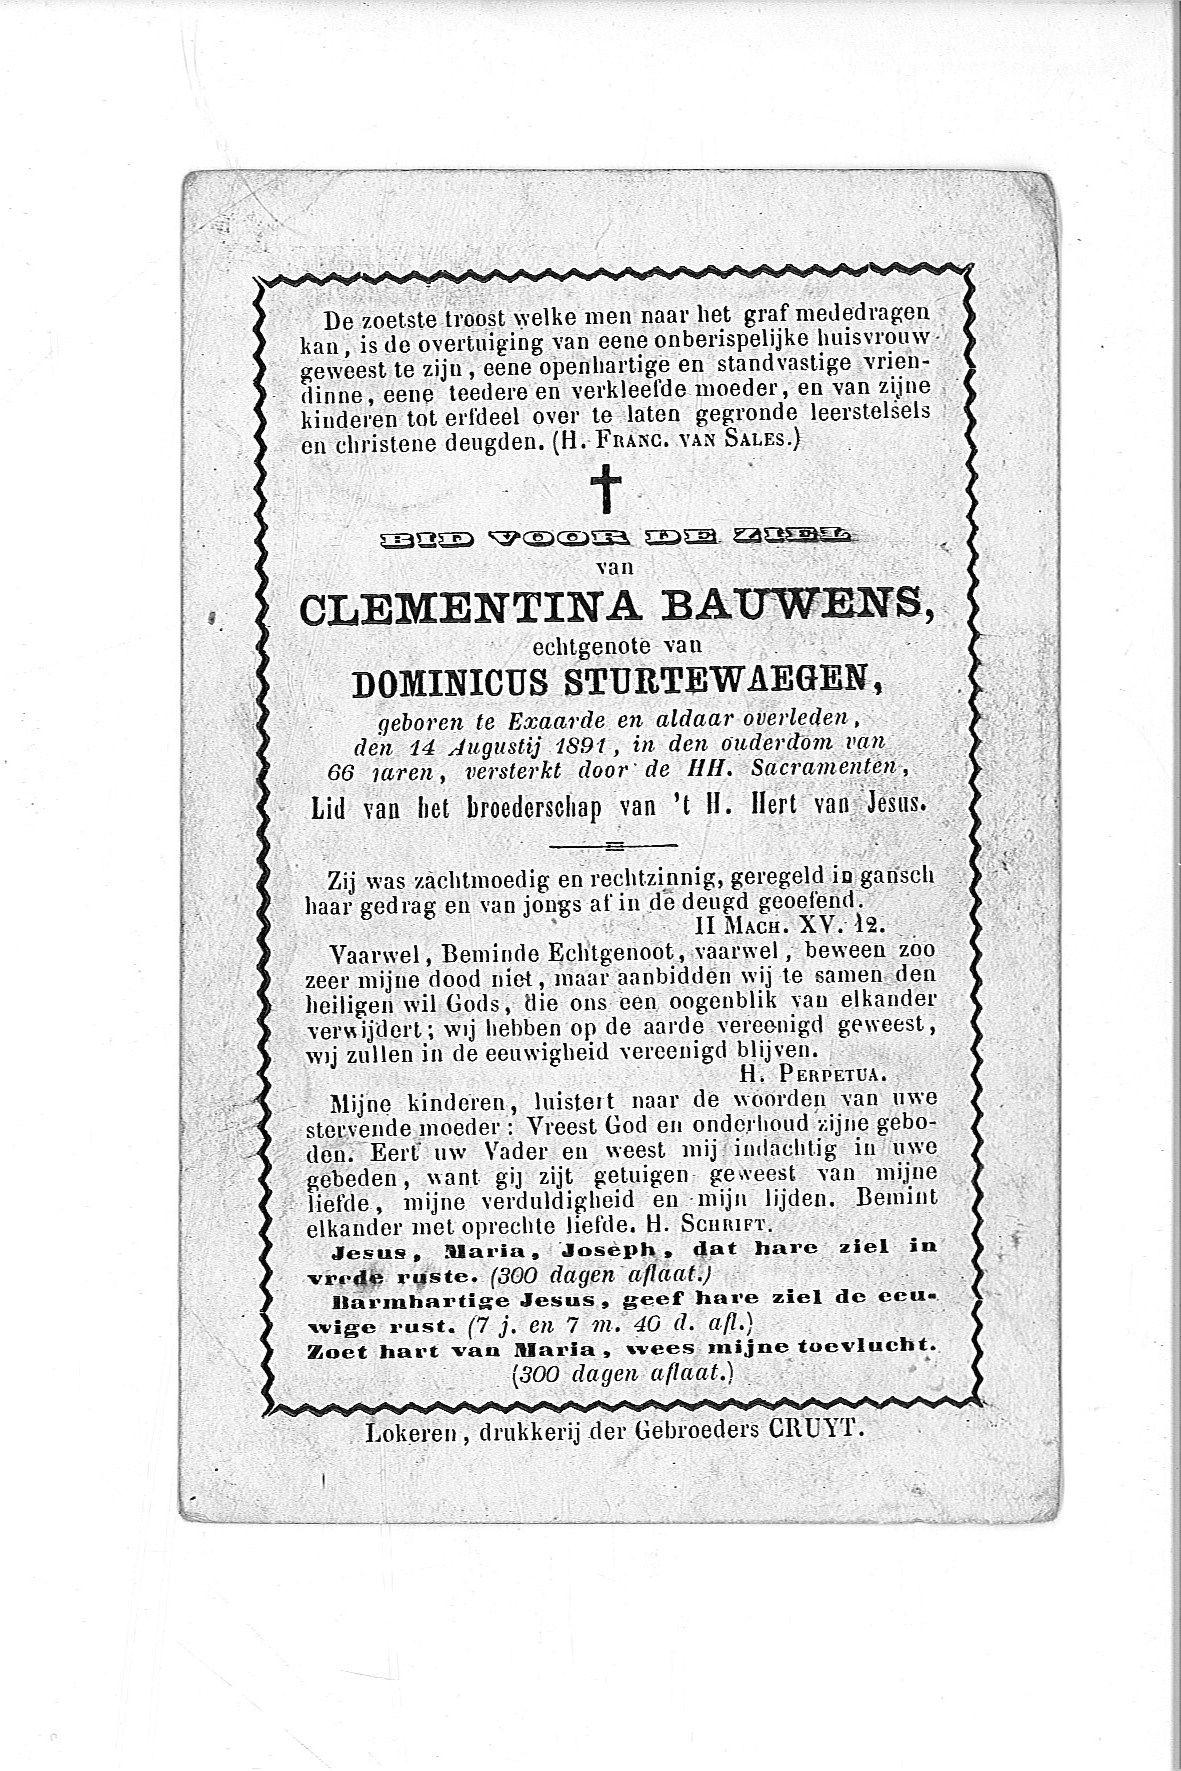 clementina(1891)20090723104548_00015.jpg